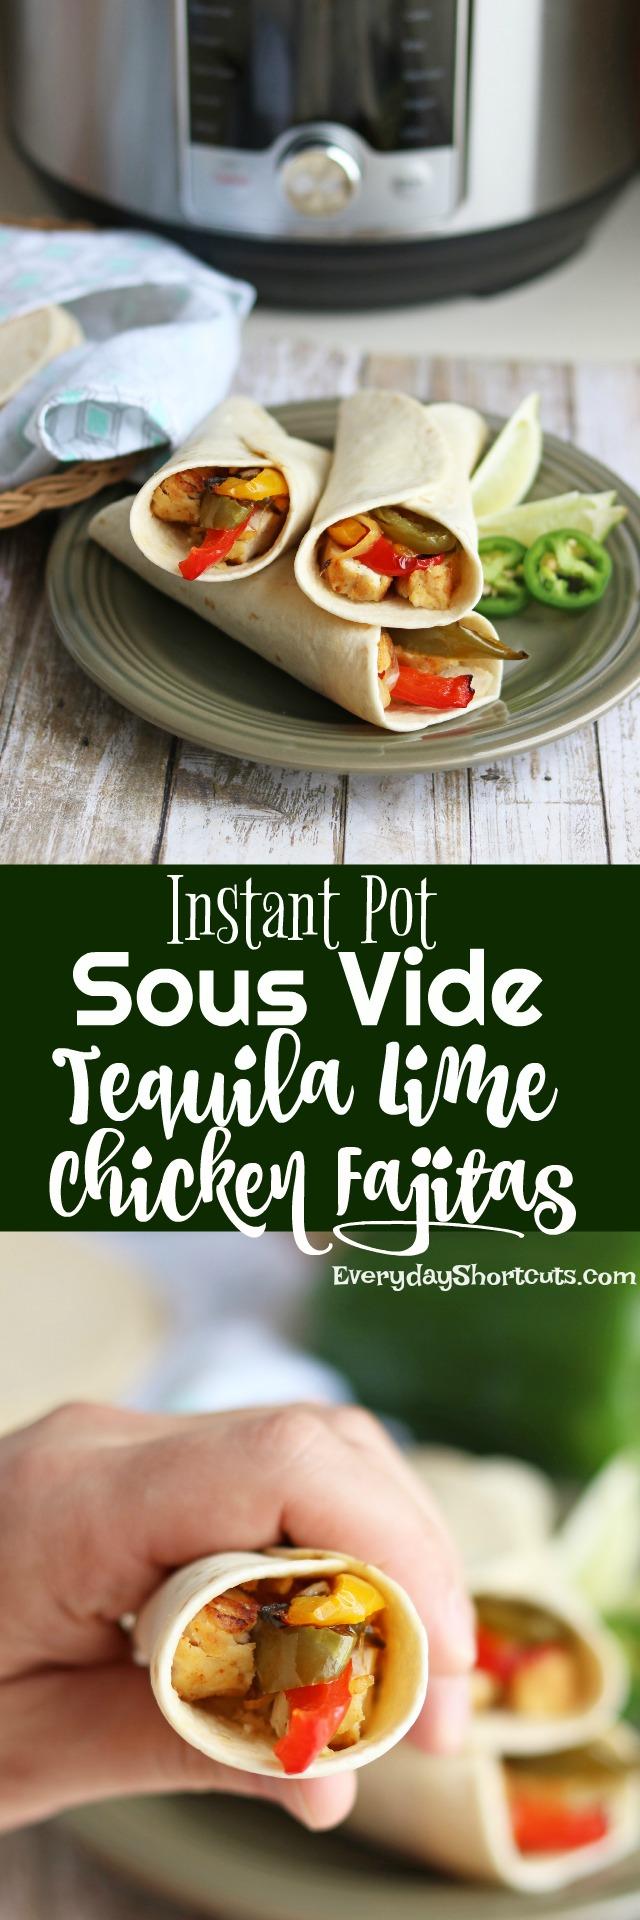 Instant-Pot-Sous-Vide-Tequila-Lime-Chicken-Fajitas